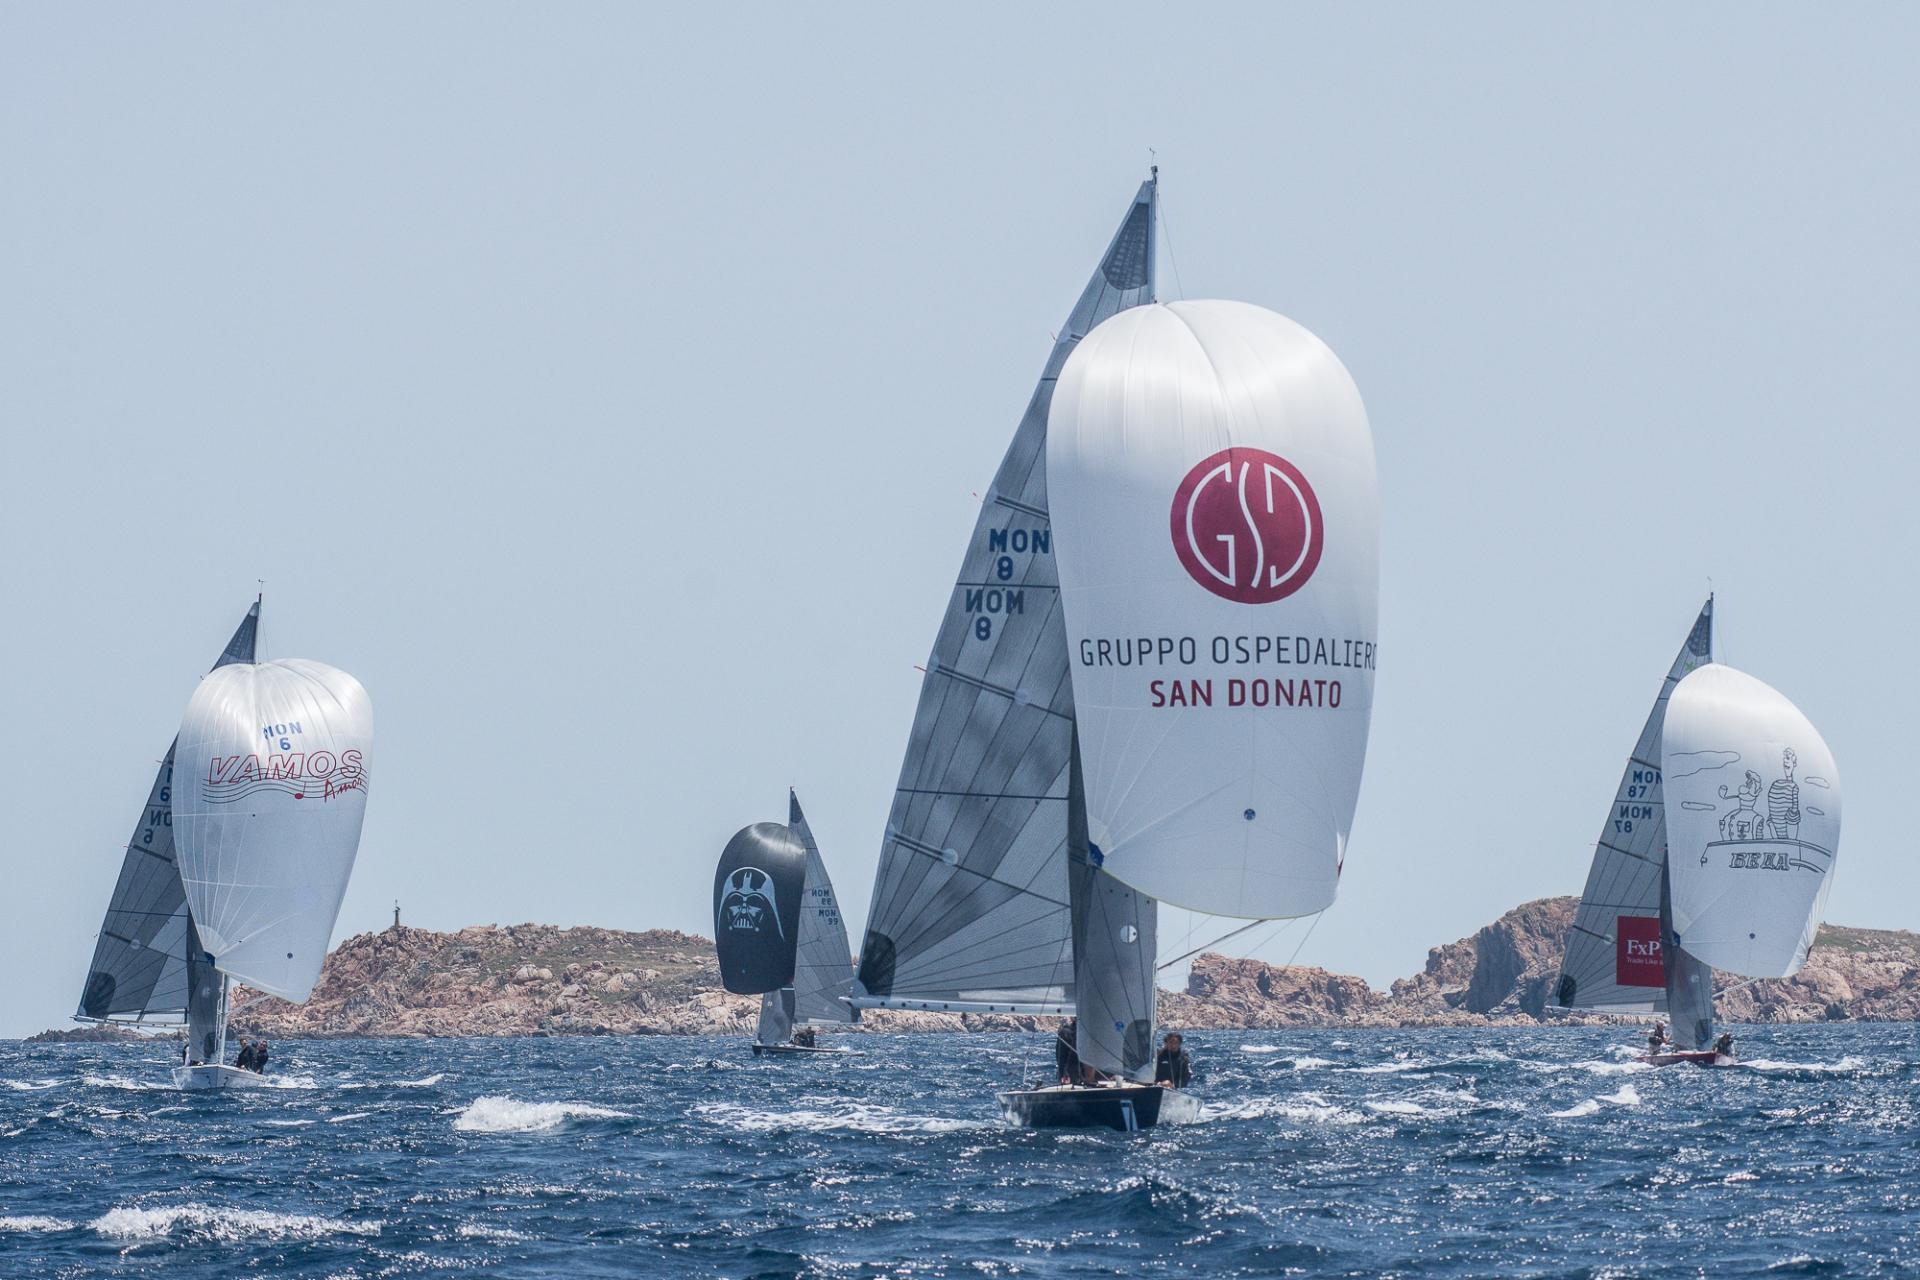 Parte oggi la Coppa Europa Smeralda 888 - NEWS - Yacht Club Costa Smeralda